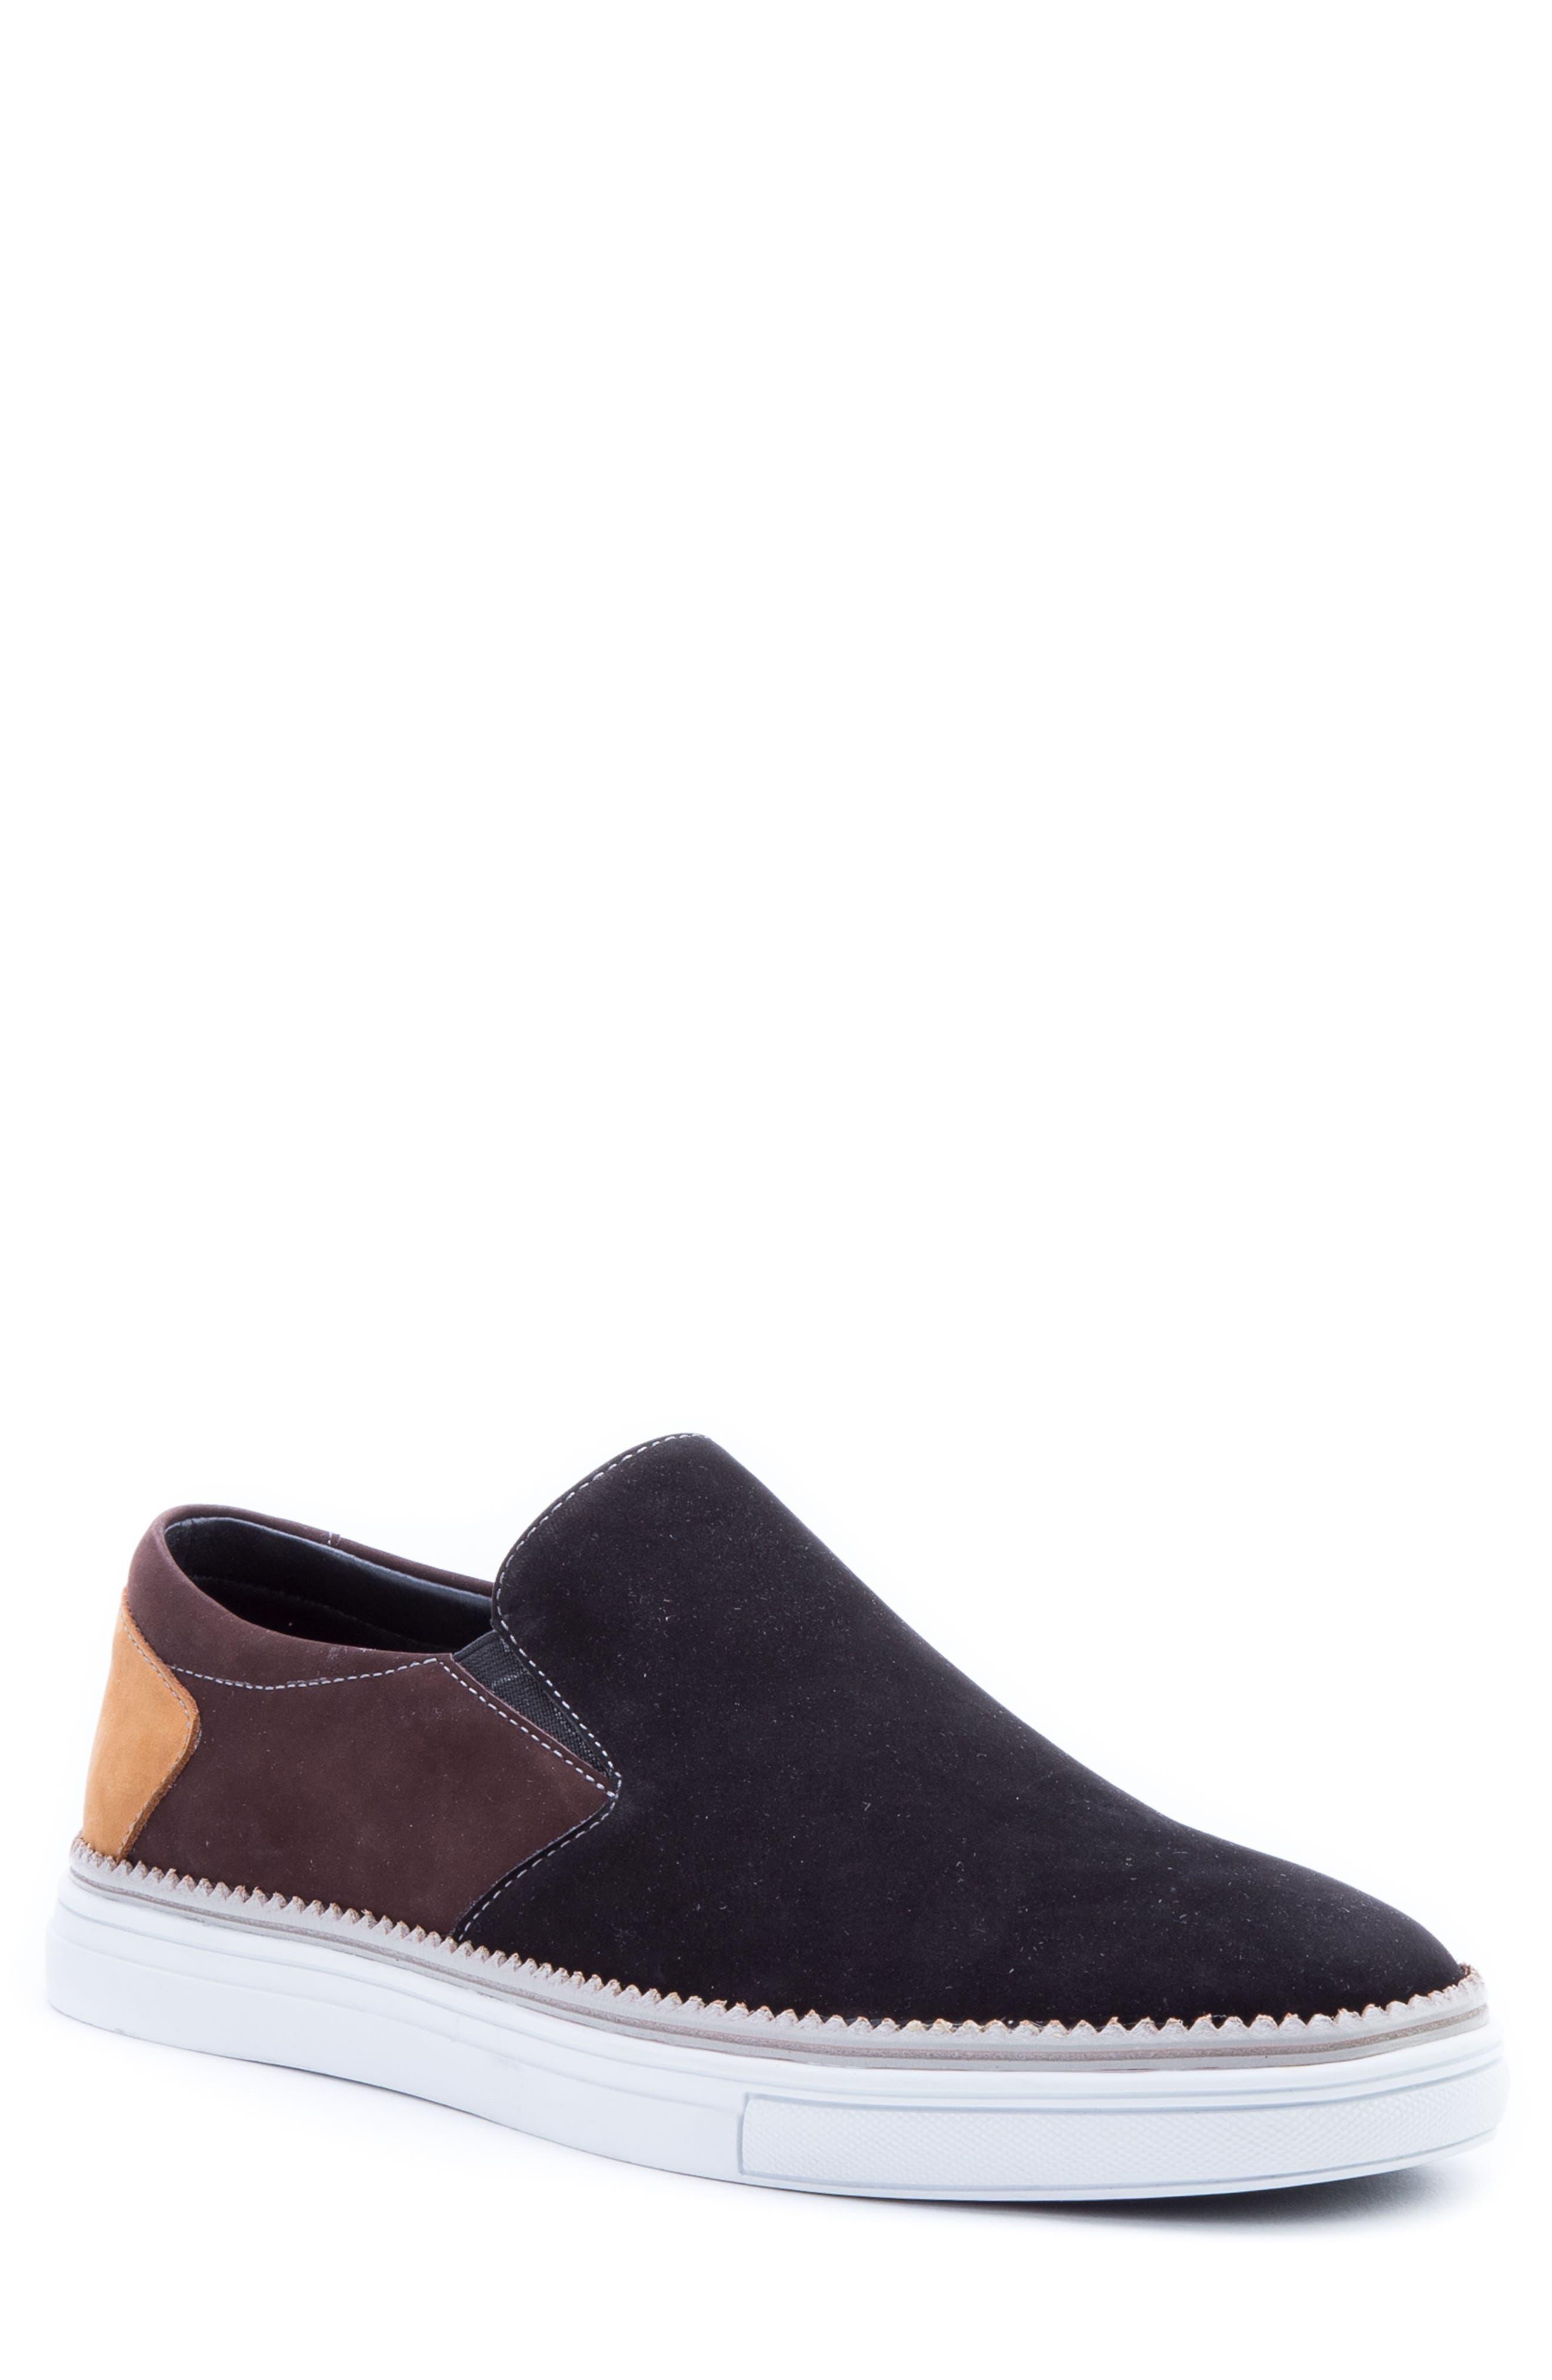 Zanzara Rivera Colorblocked Slip-On Sneaker, Black